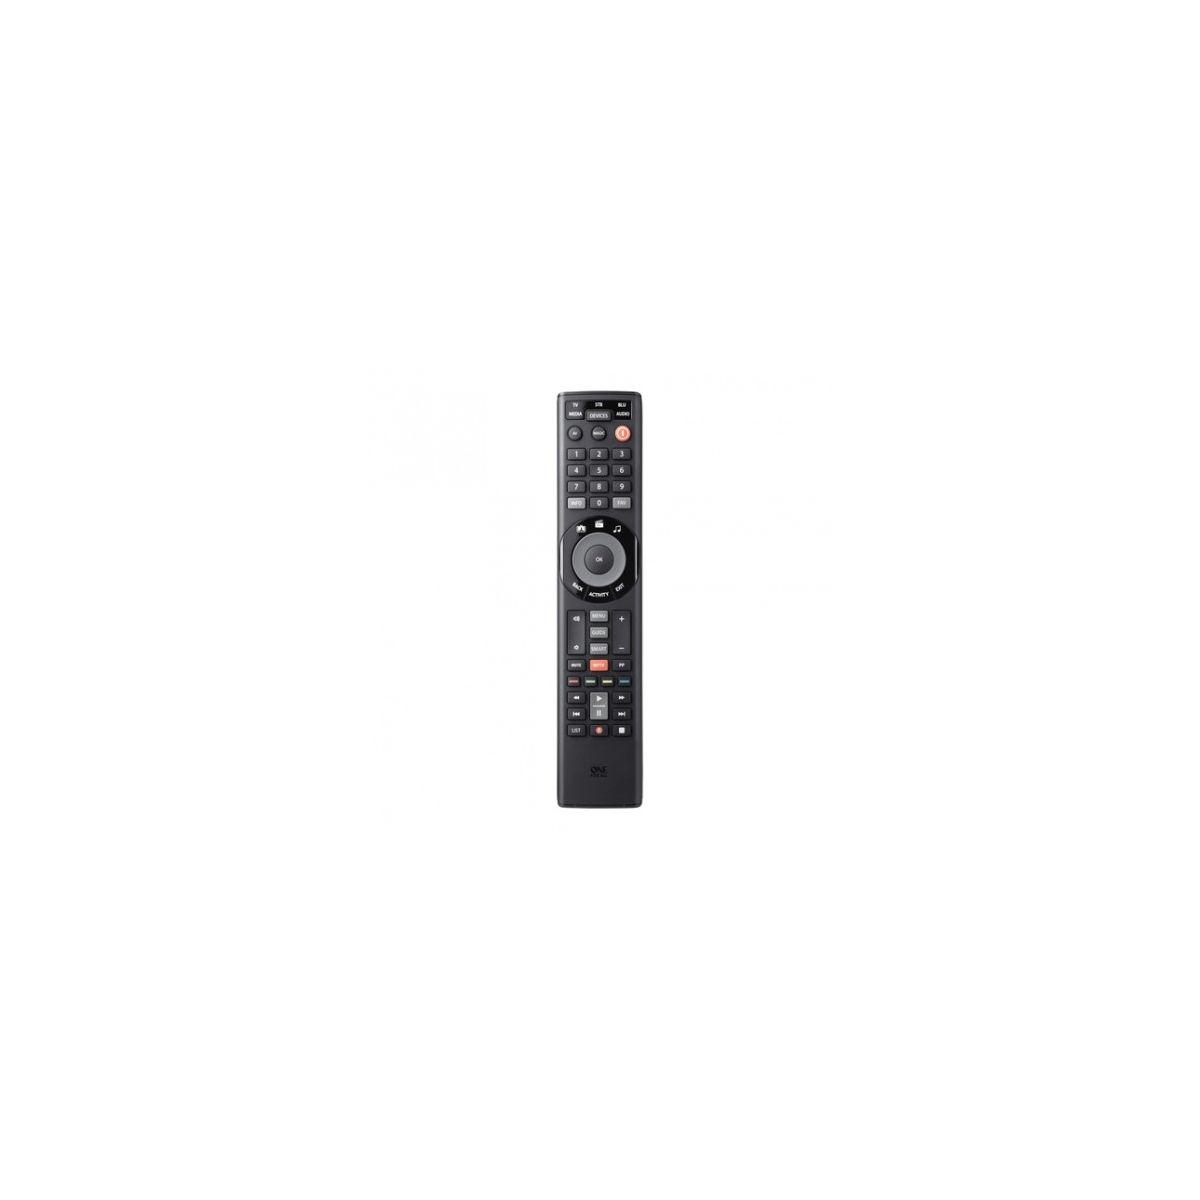 Télécommande universelle ONE FOR ALL URC7955 SMART CONTROL 5